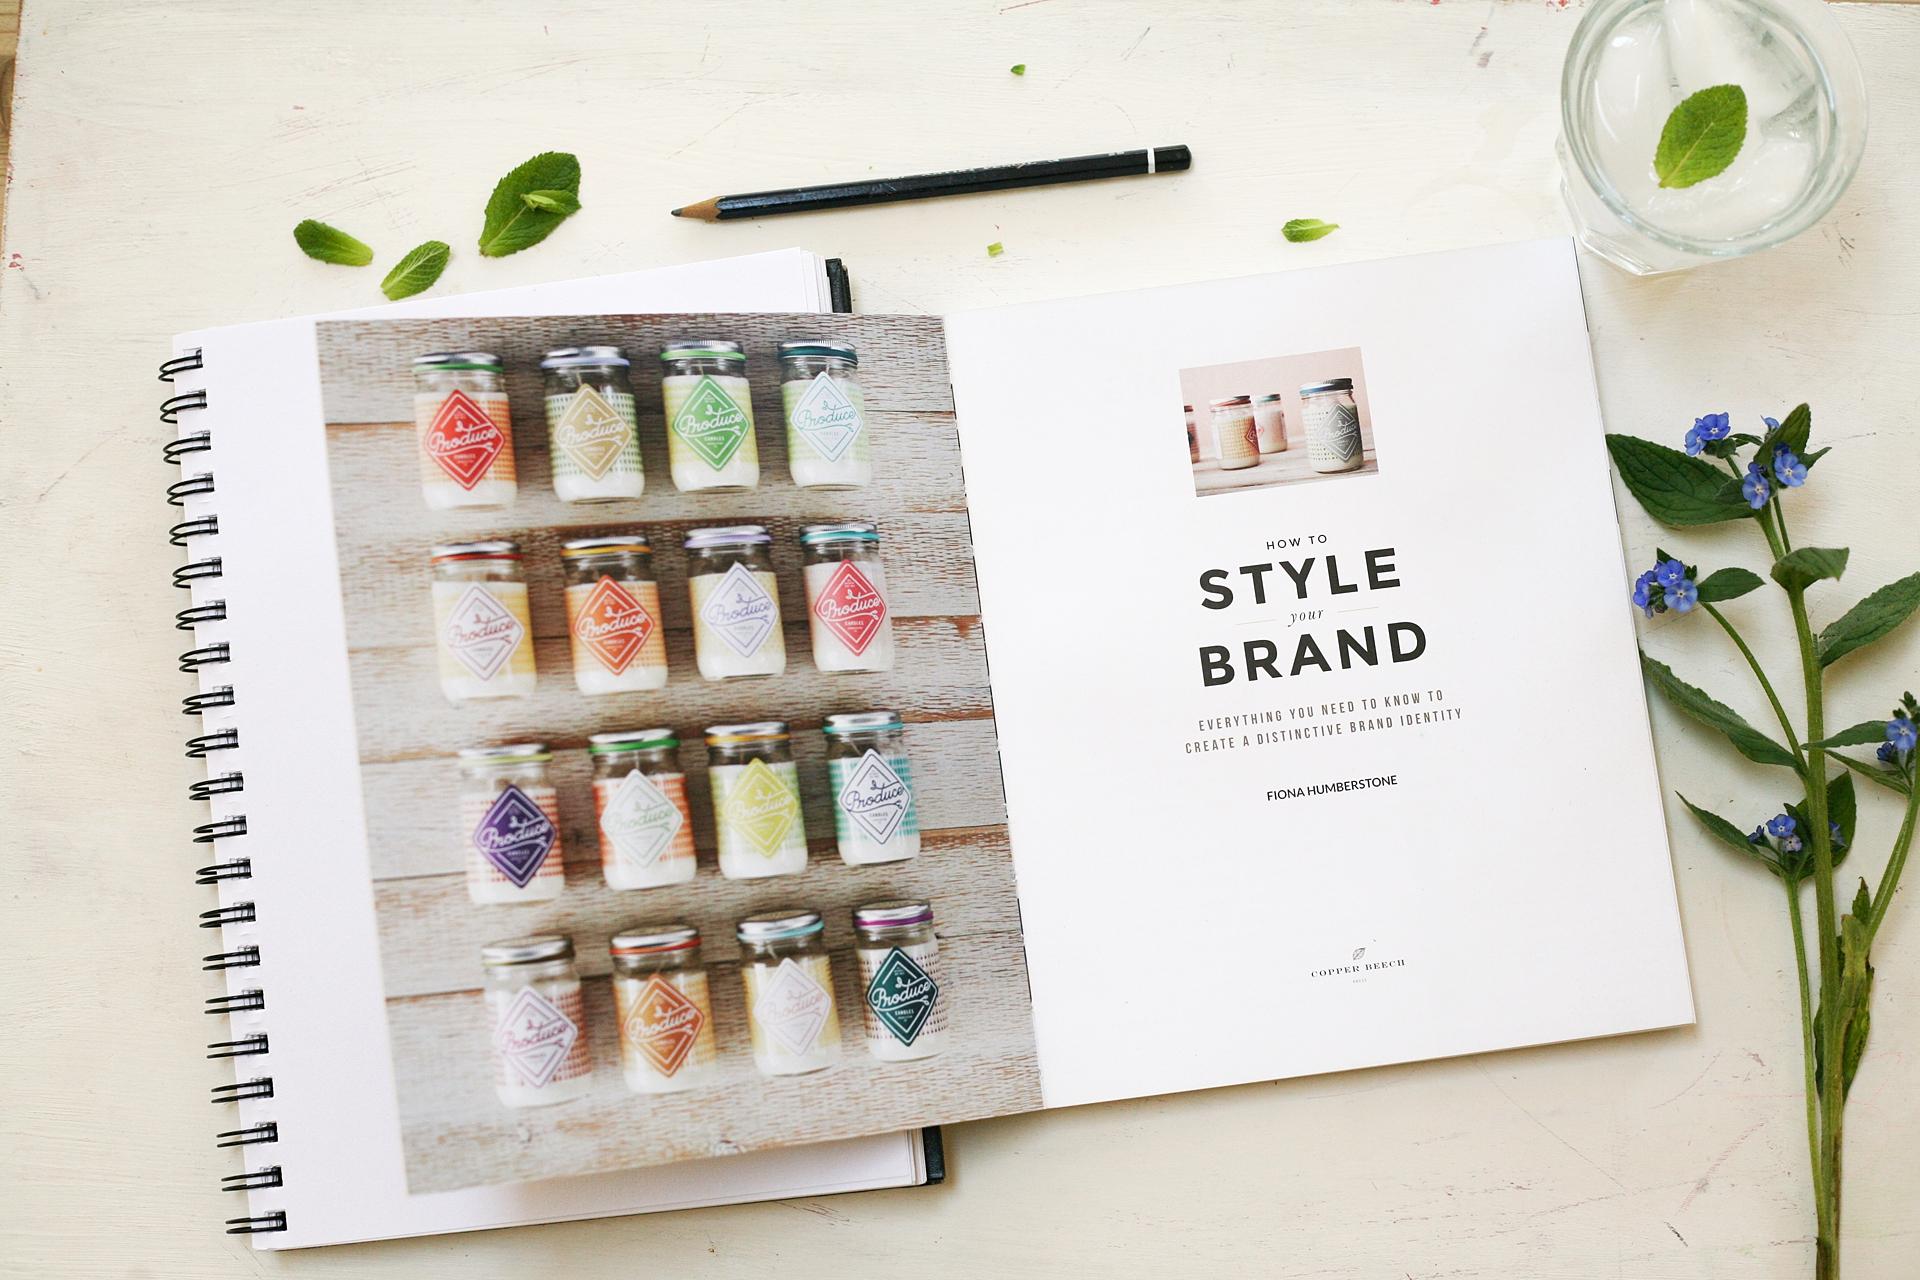 The Brand Stylist Book Fiona Humberstone_0015.jpg